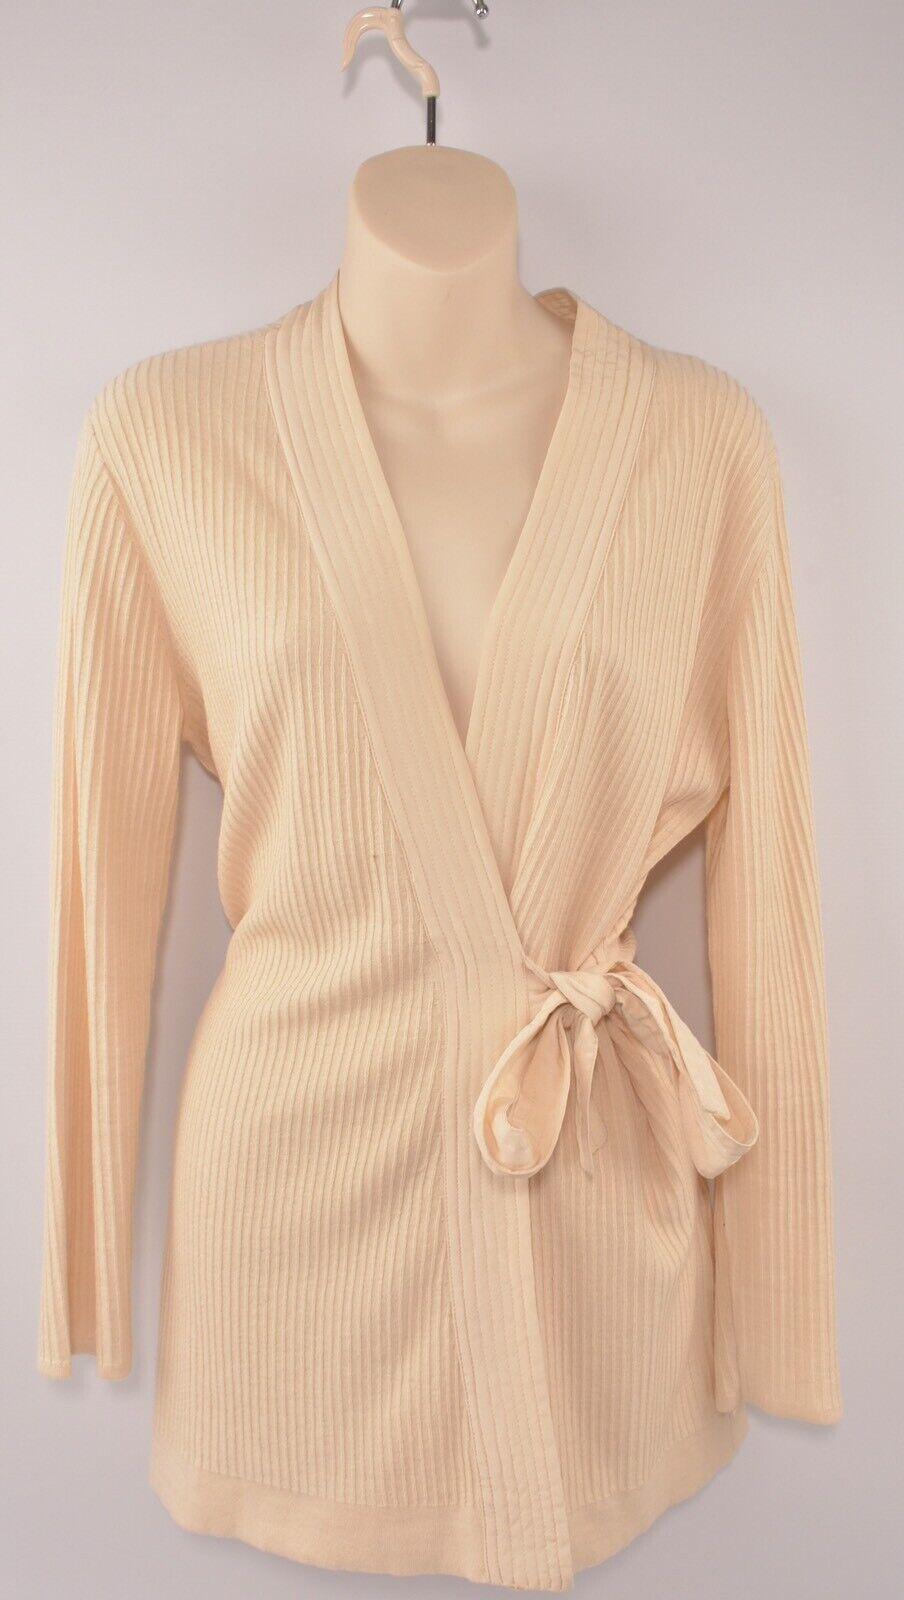 SANDRO Women's Wrap Around Ribbed Cardigan, size